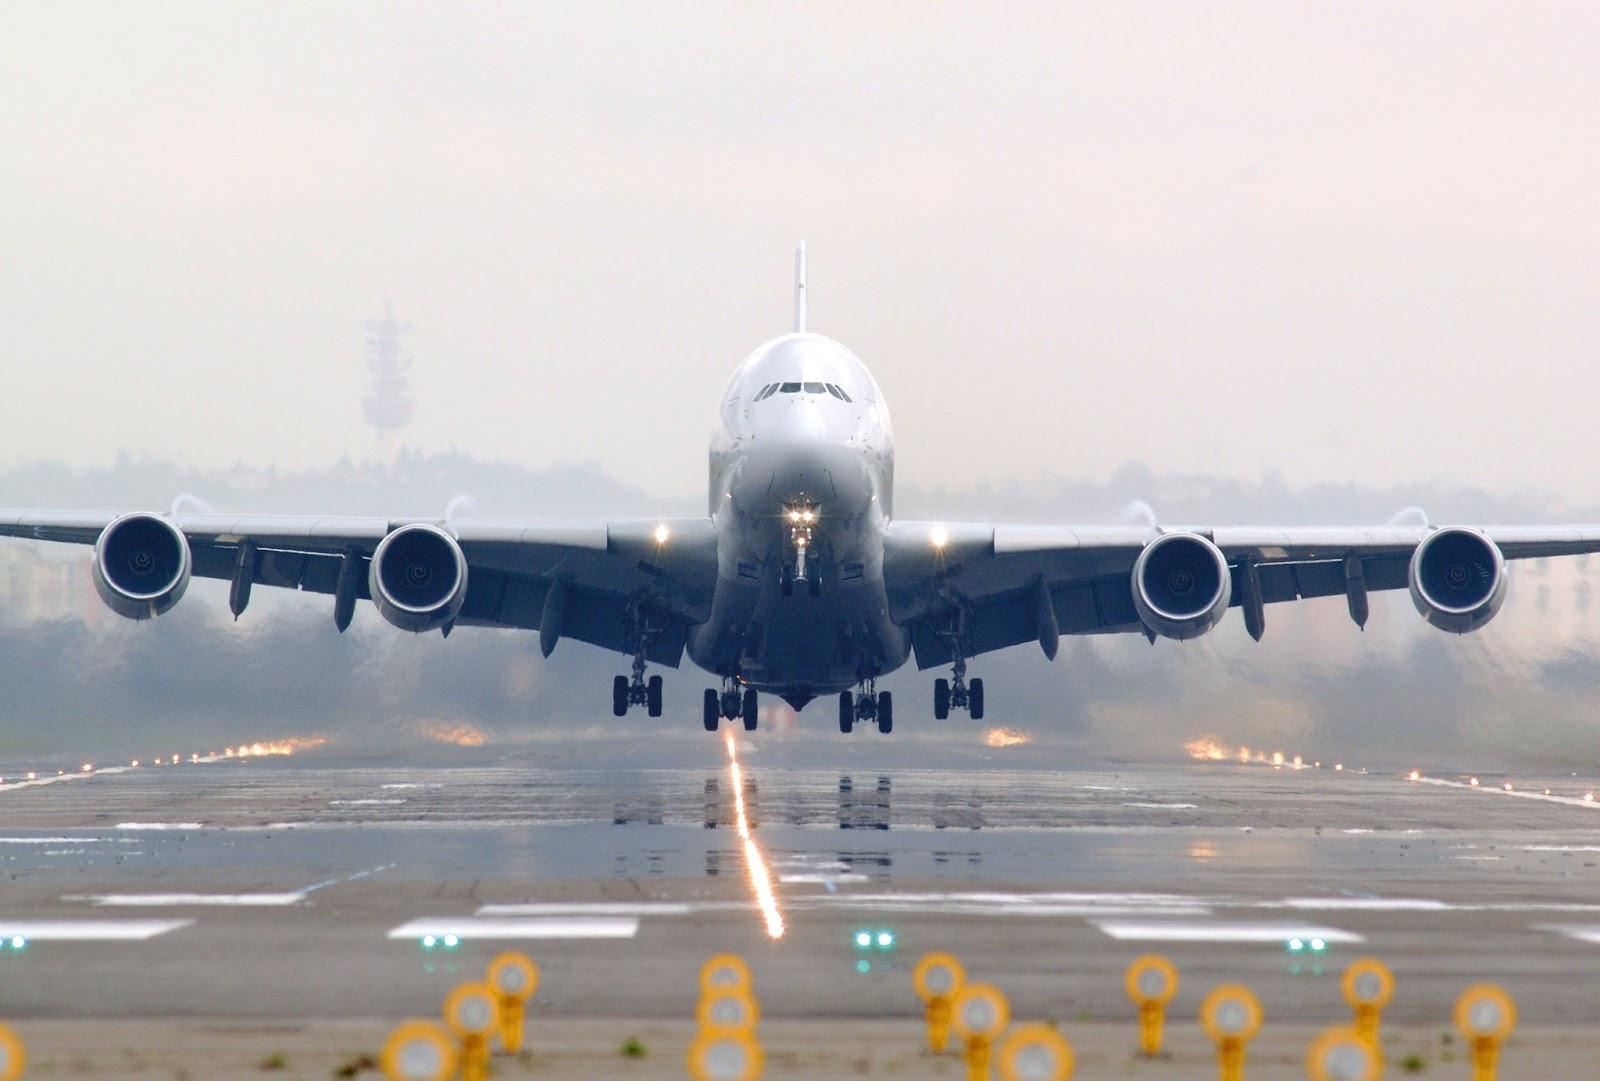 Airbus A380 Of Air France Takeoff Aircraft Wallpaper 3291